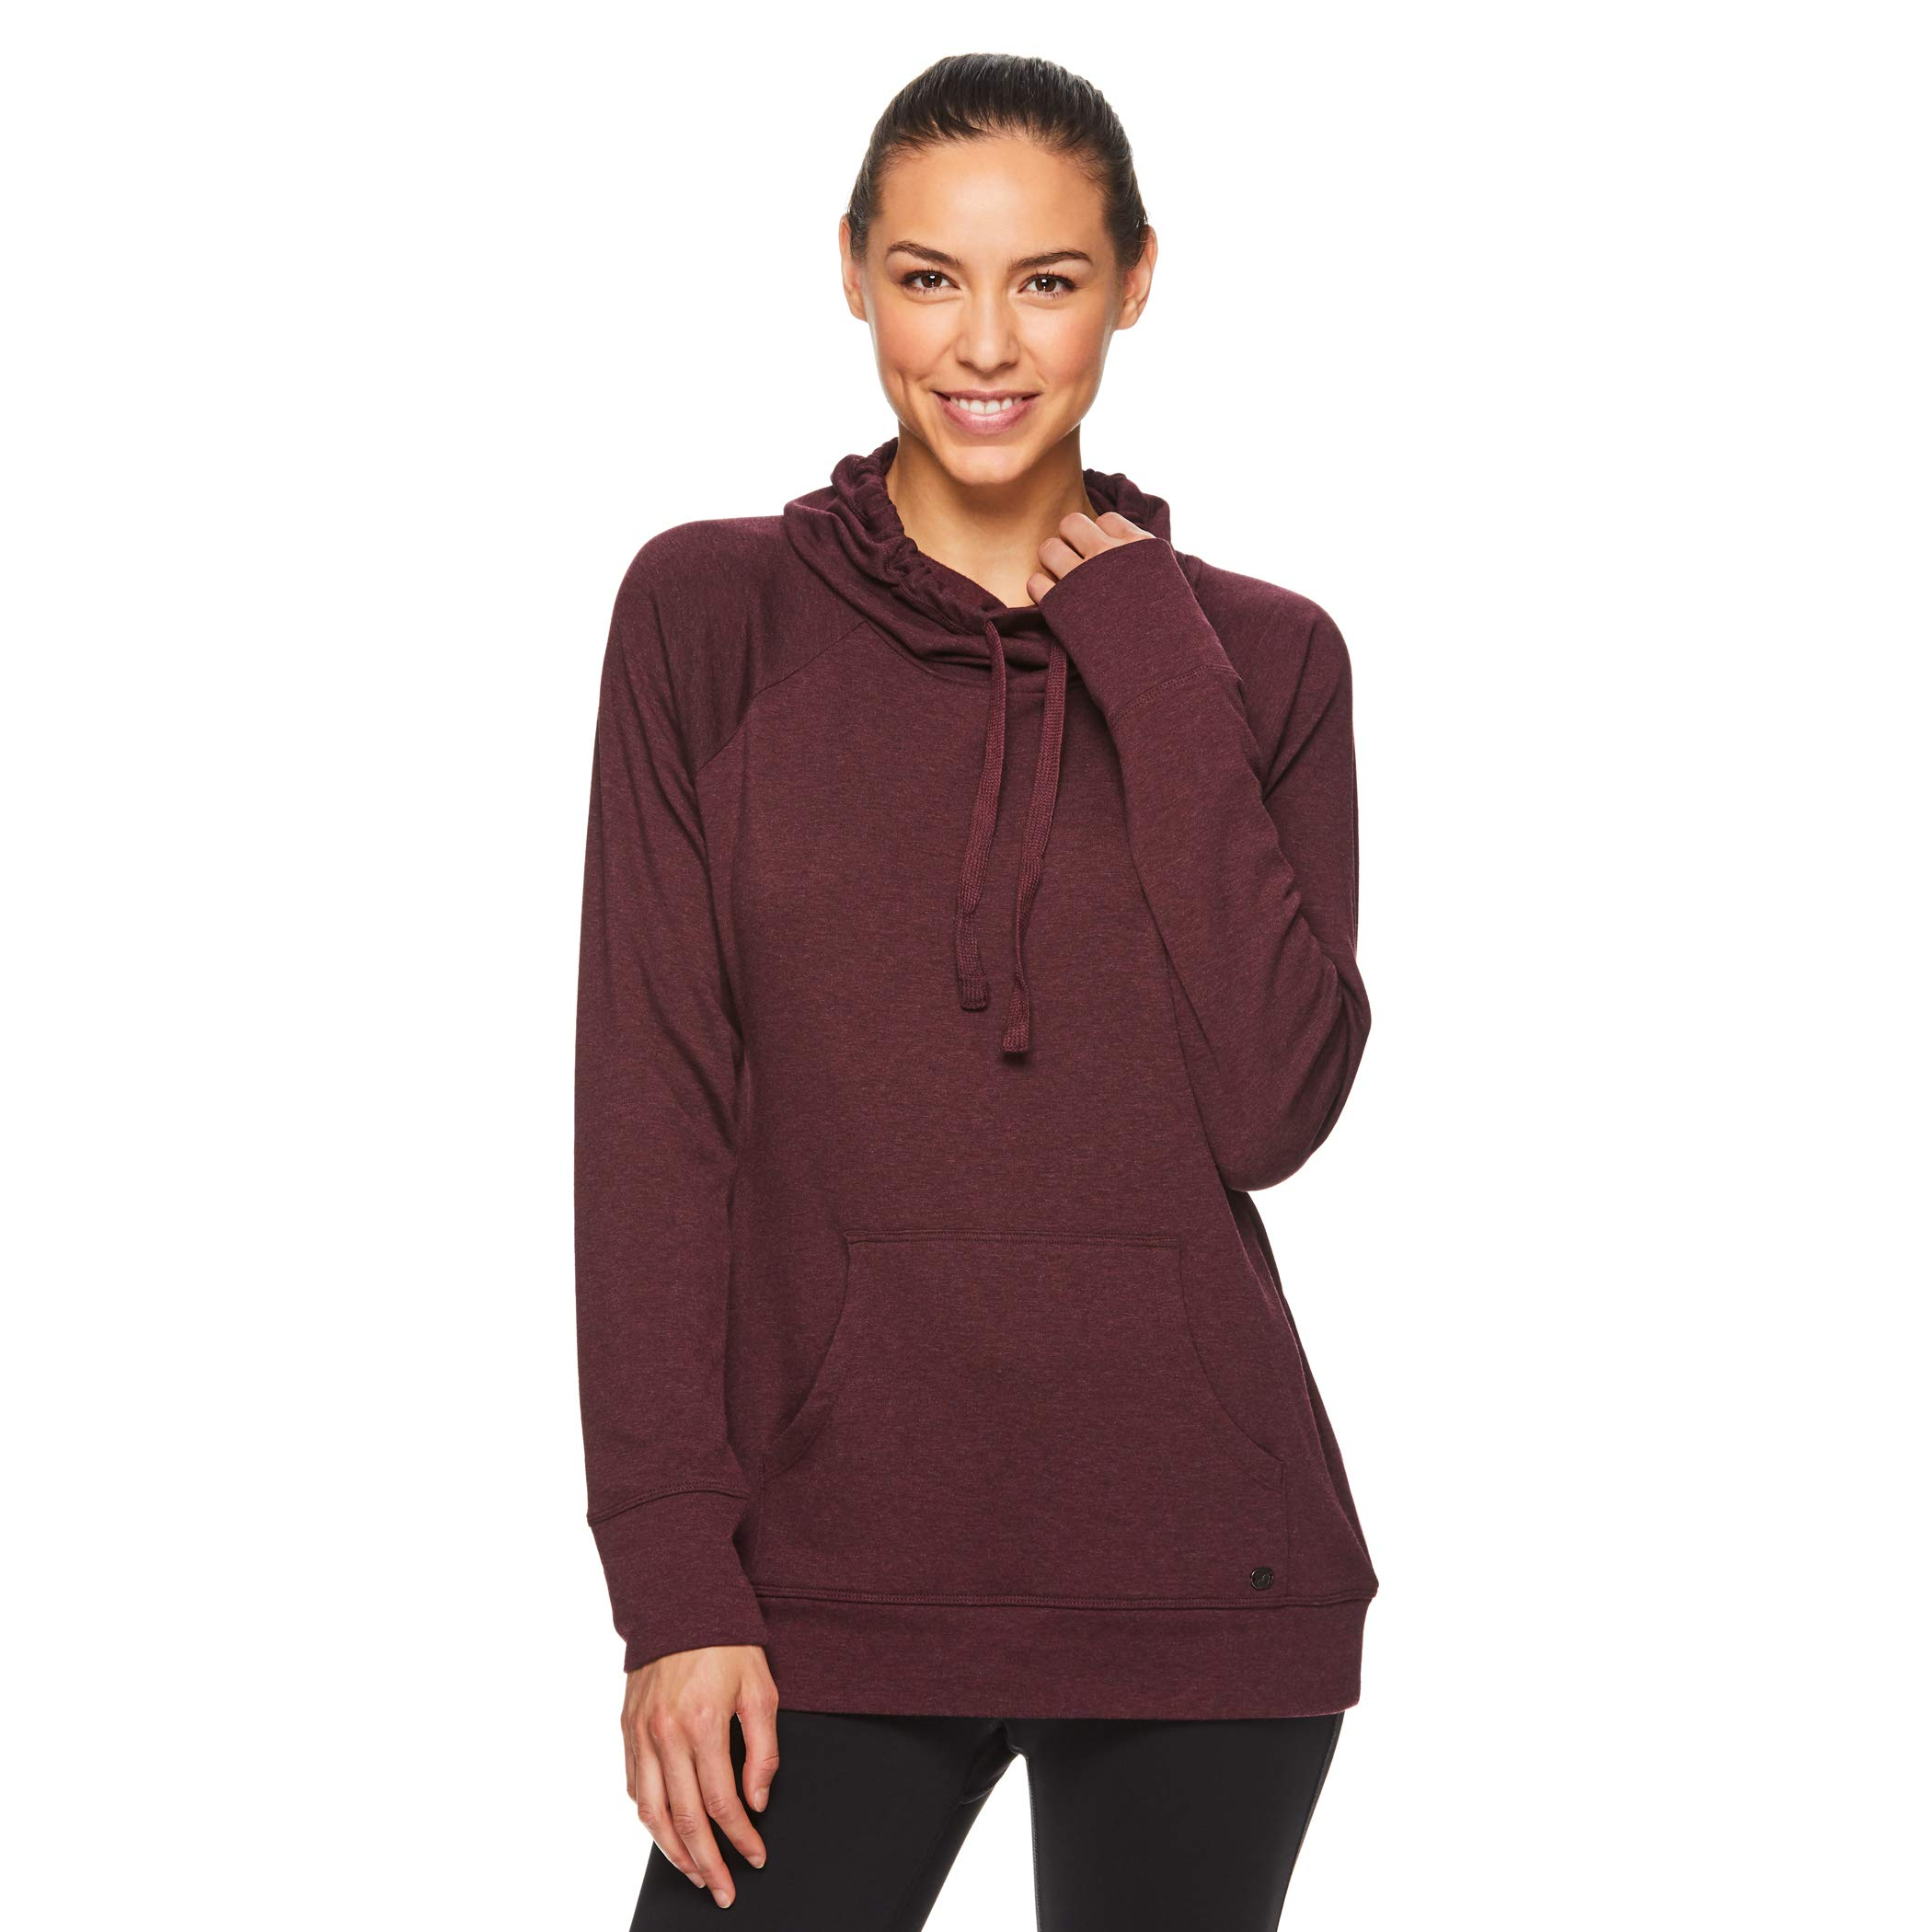 Gaiam Women's Pullover Hoodie Yoga Sweatshirt - Lightweight Long Sleeve Athleisure Sweater - Grace Winetasting Red Heather, X-Small by Gaiam